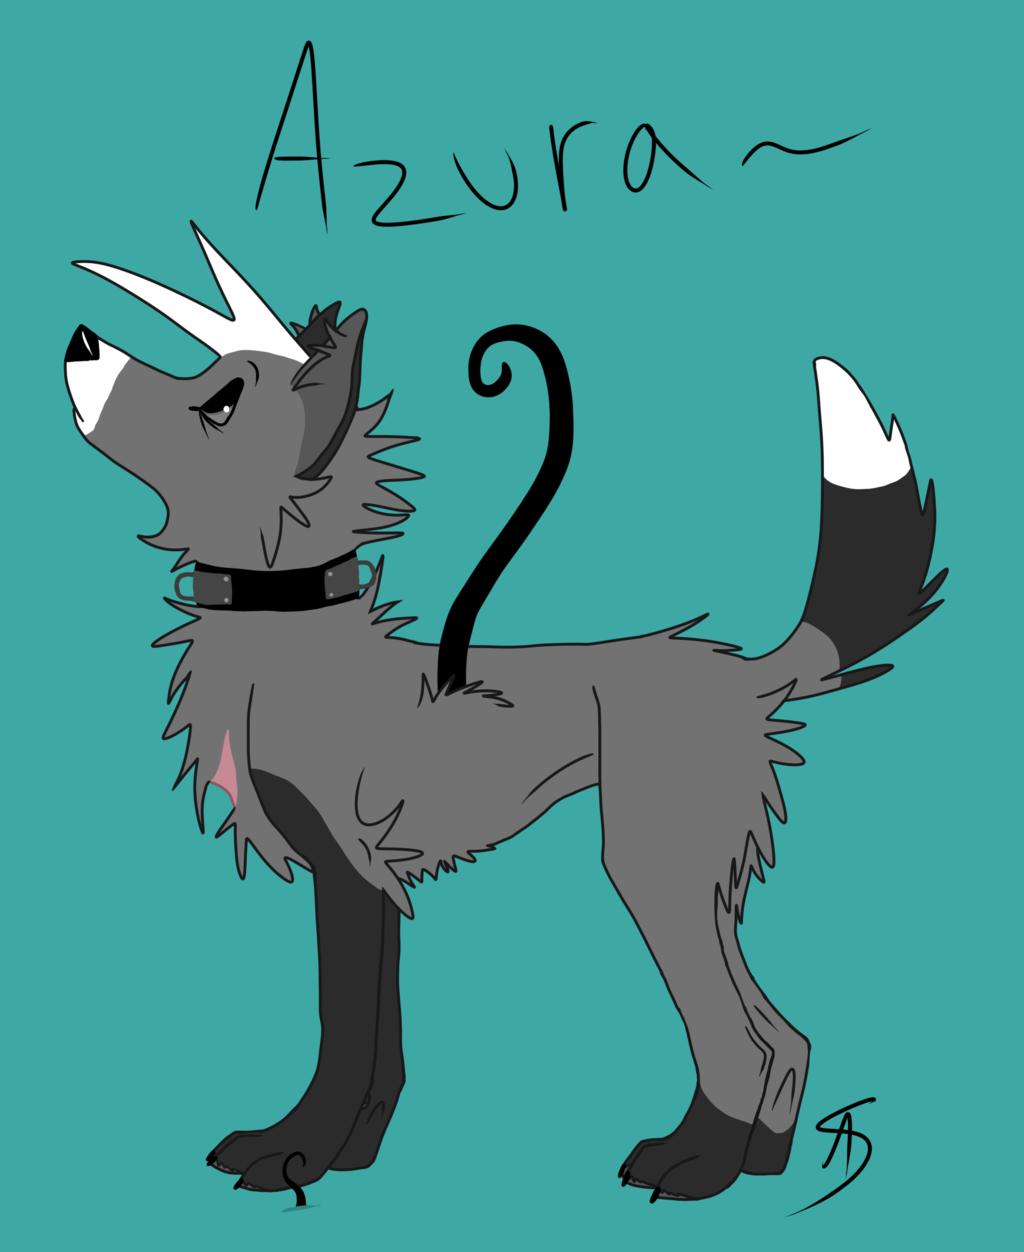 New Azura Reference